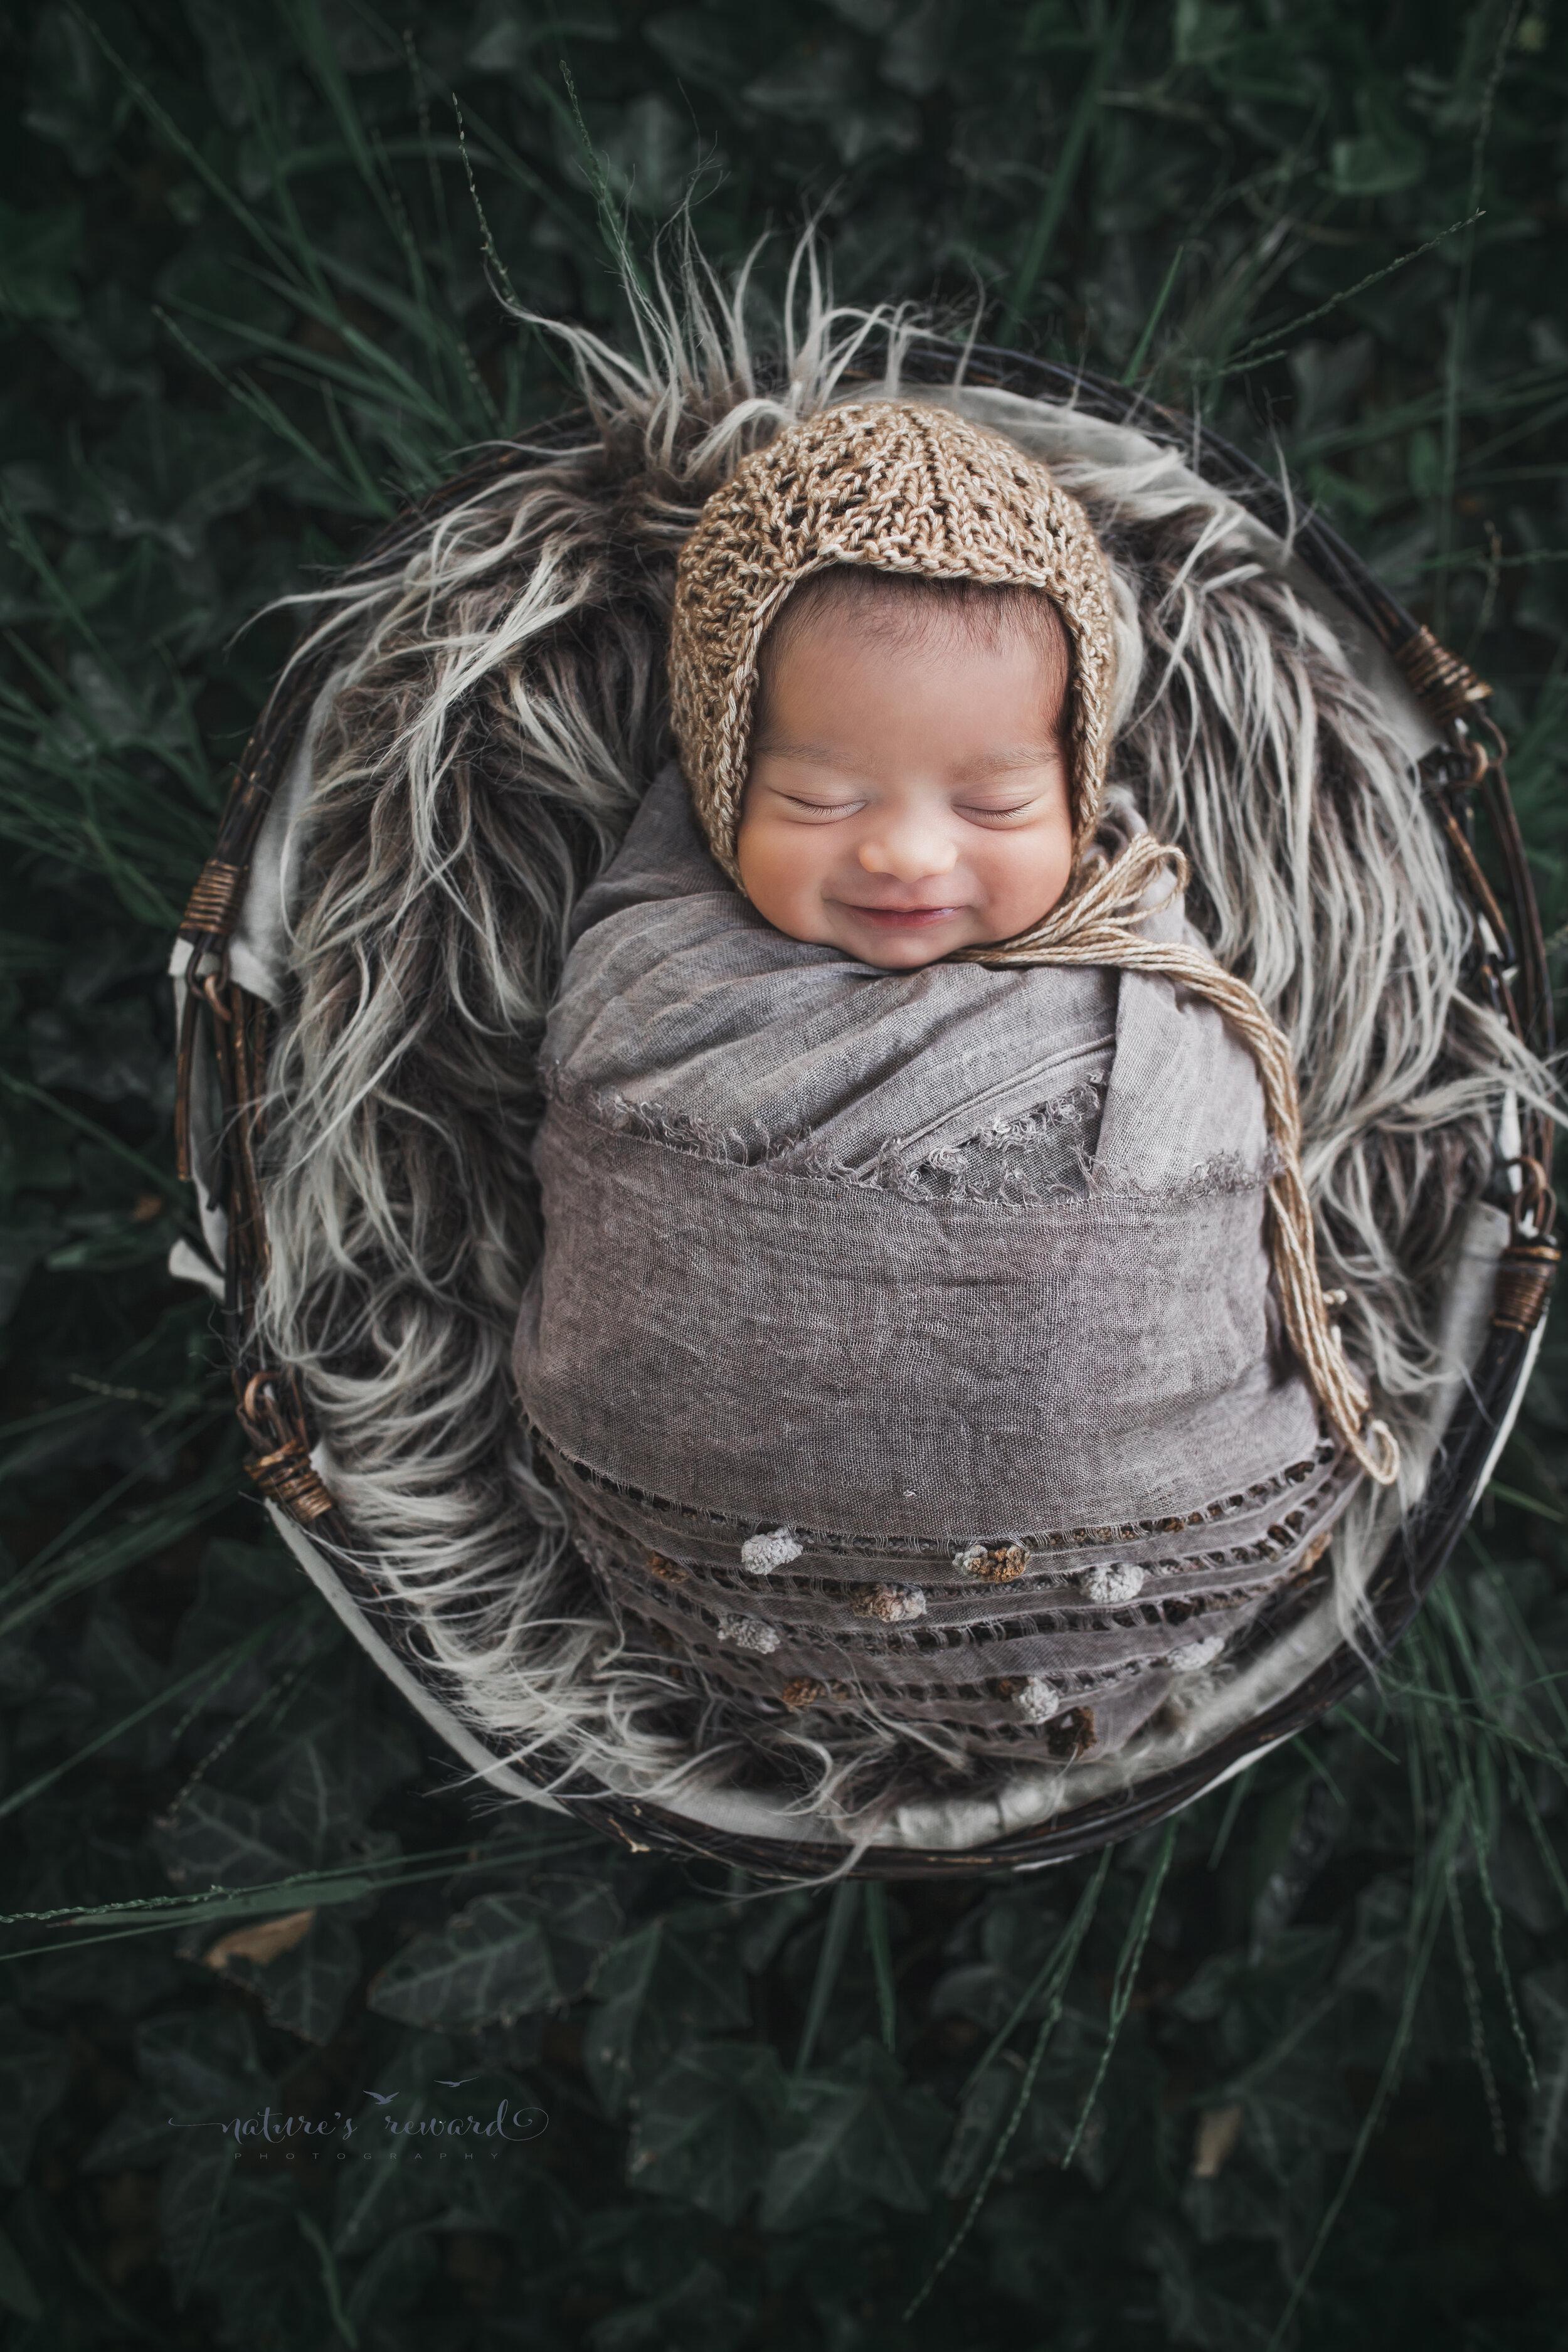 Newborn baby Girl in the garden smiling, a newborn portrait by Nature's Reward Photography